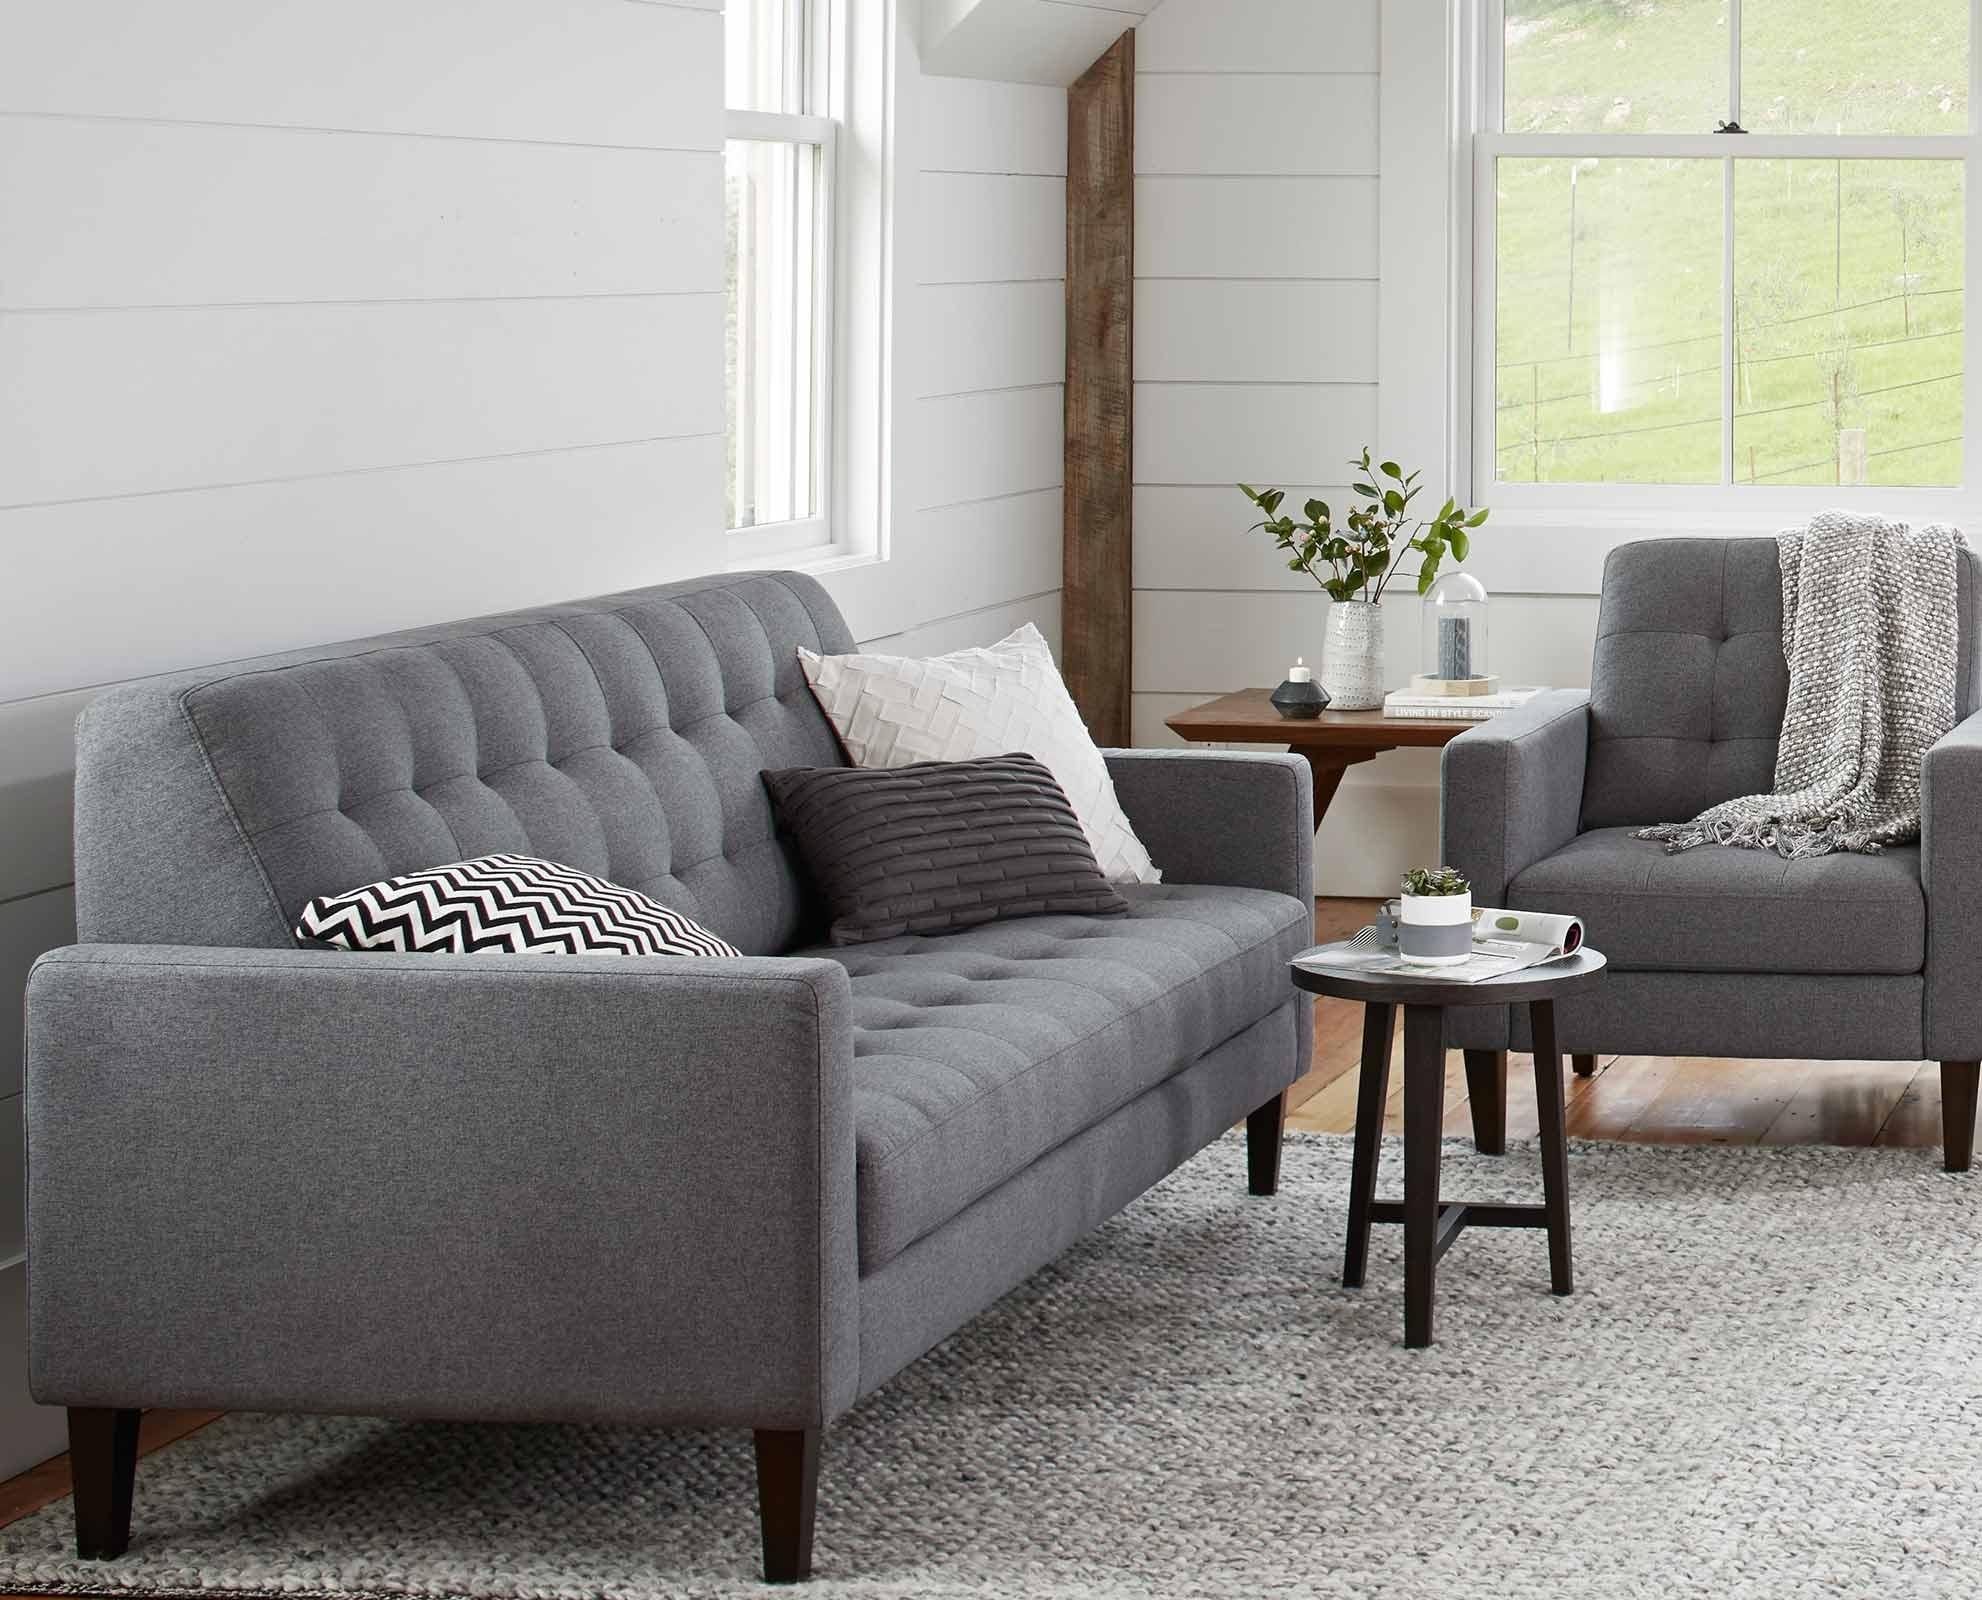 Furniture: Modern Living Room Sofas Designtillary Sofa — Spy For Dania Sectional Sofas (View 7 of 10)